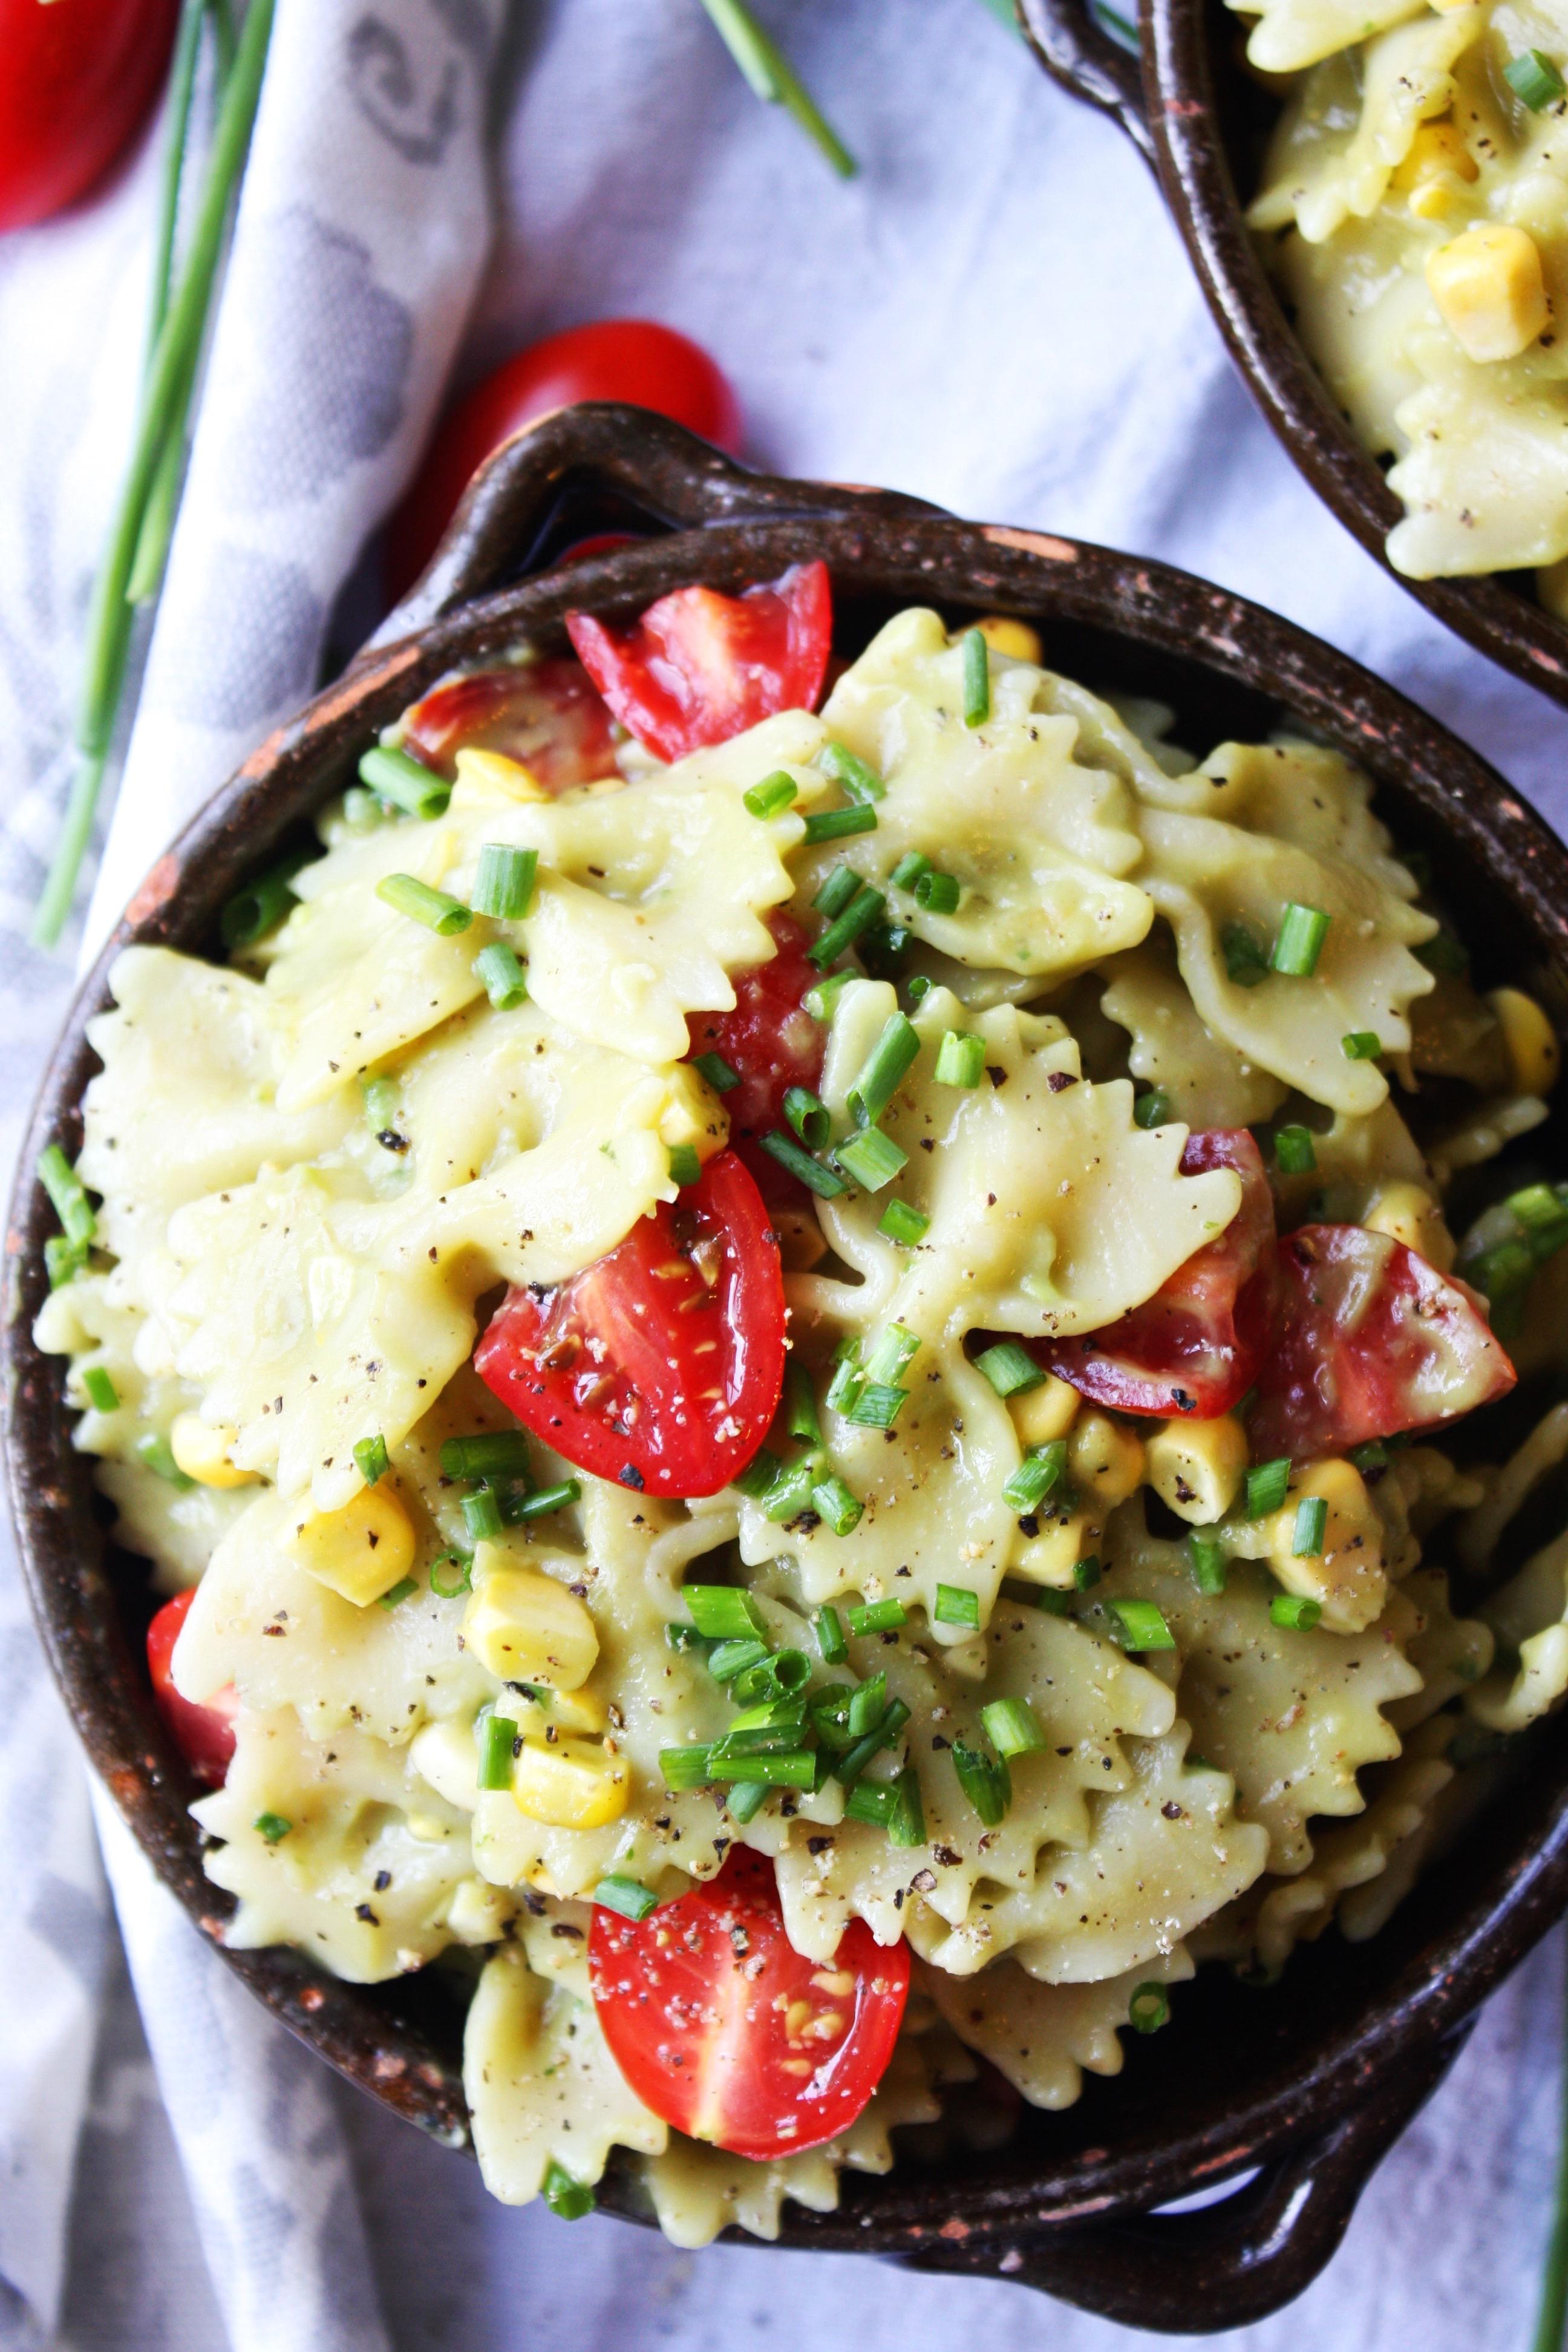 Pasta Salad With Creamy Avocado Sauce